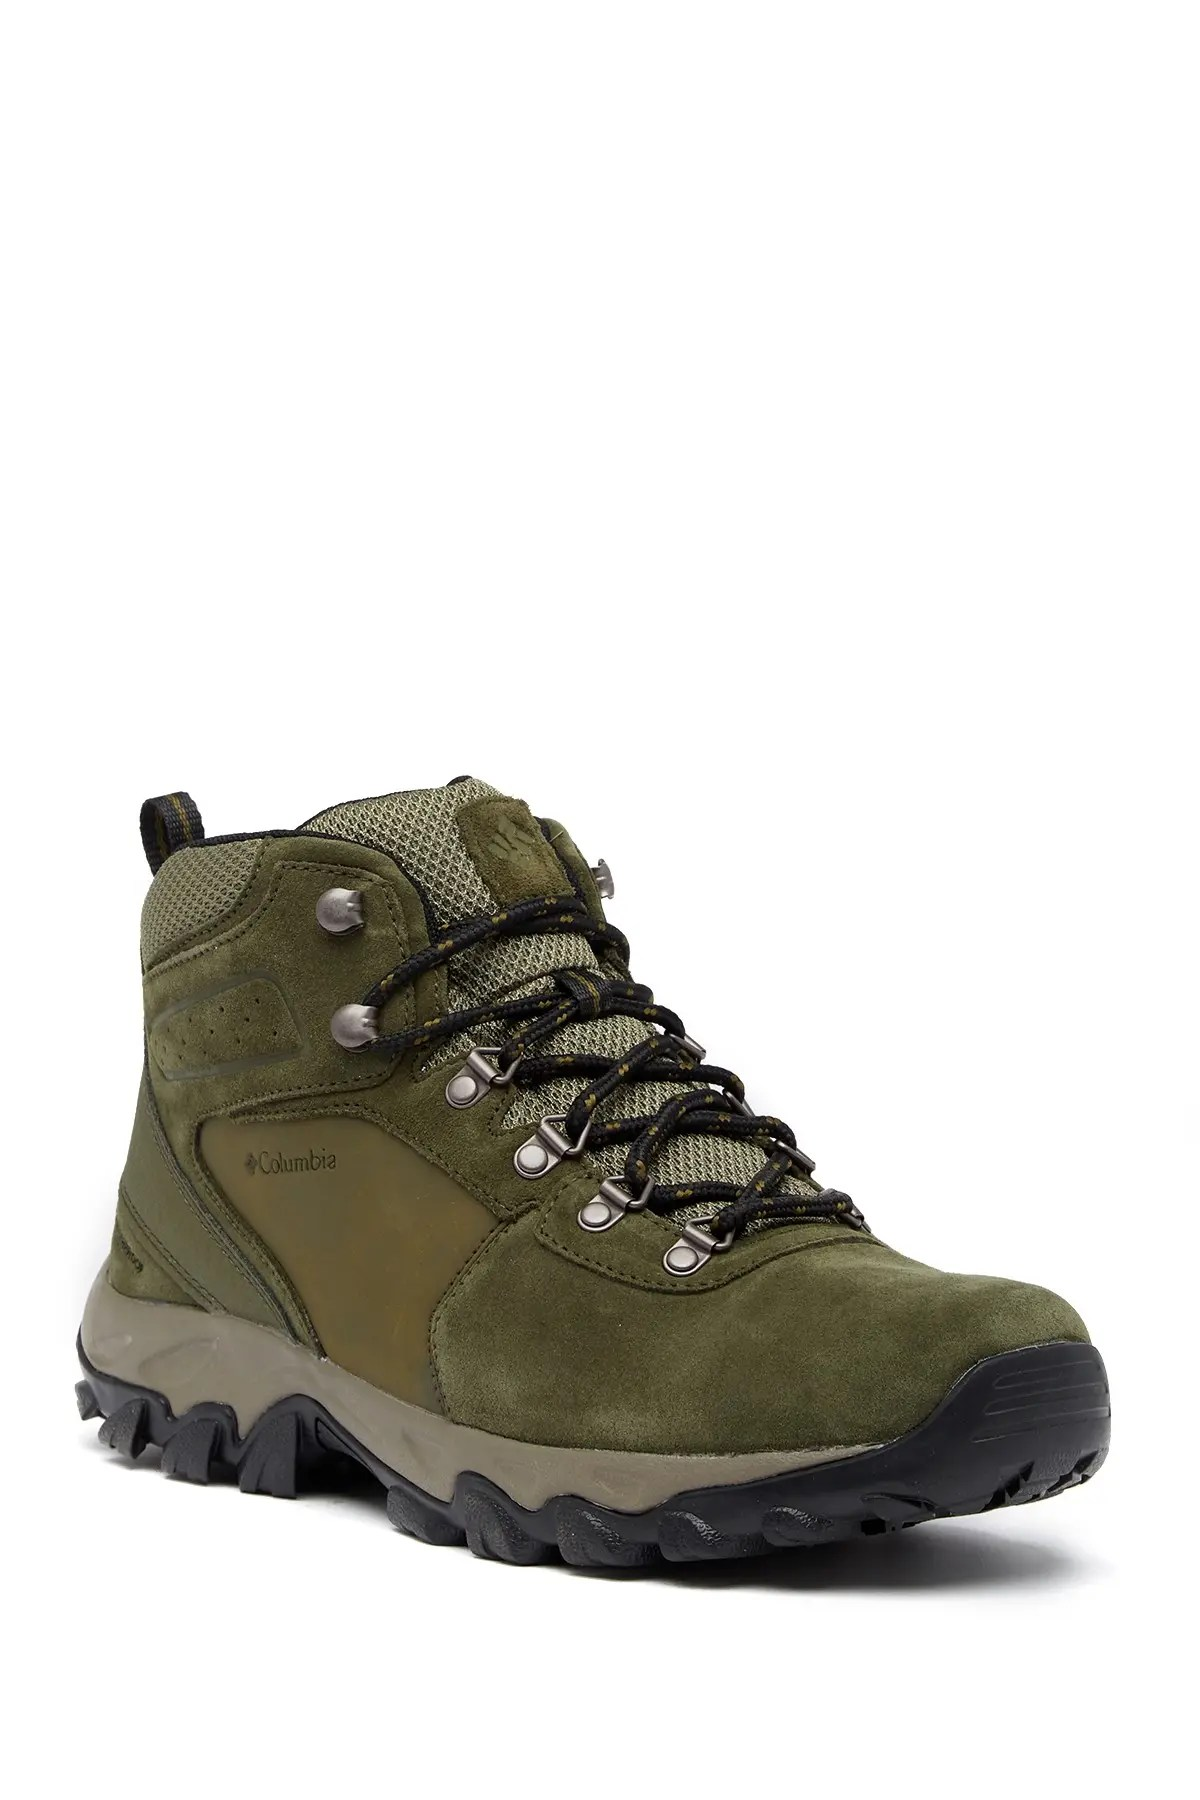 columbia newton ridge plus ii waterproof hiking boot nordstrom rack